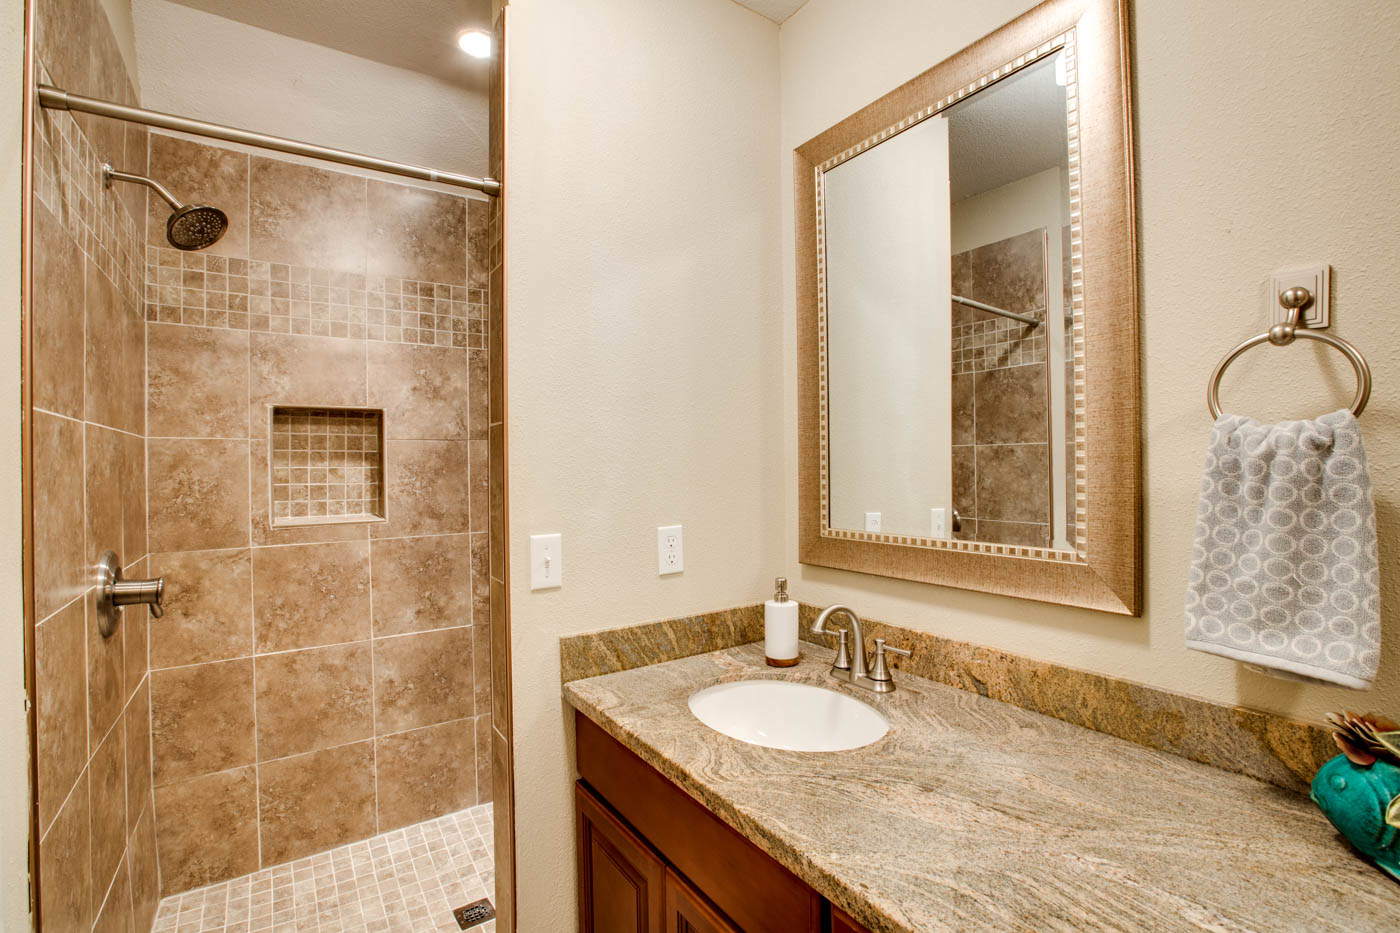 master suite bath_upper_5314 SE Milwaukie Ave_059_webres.jpg